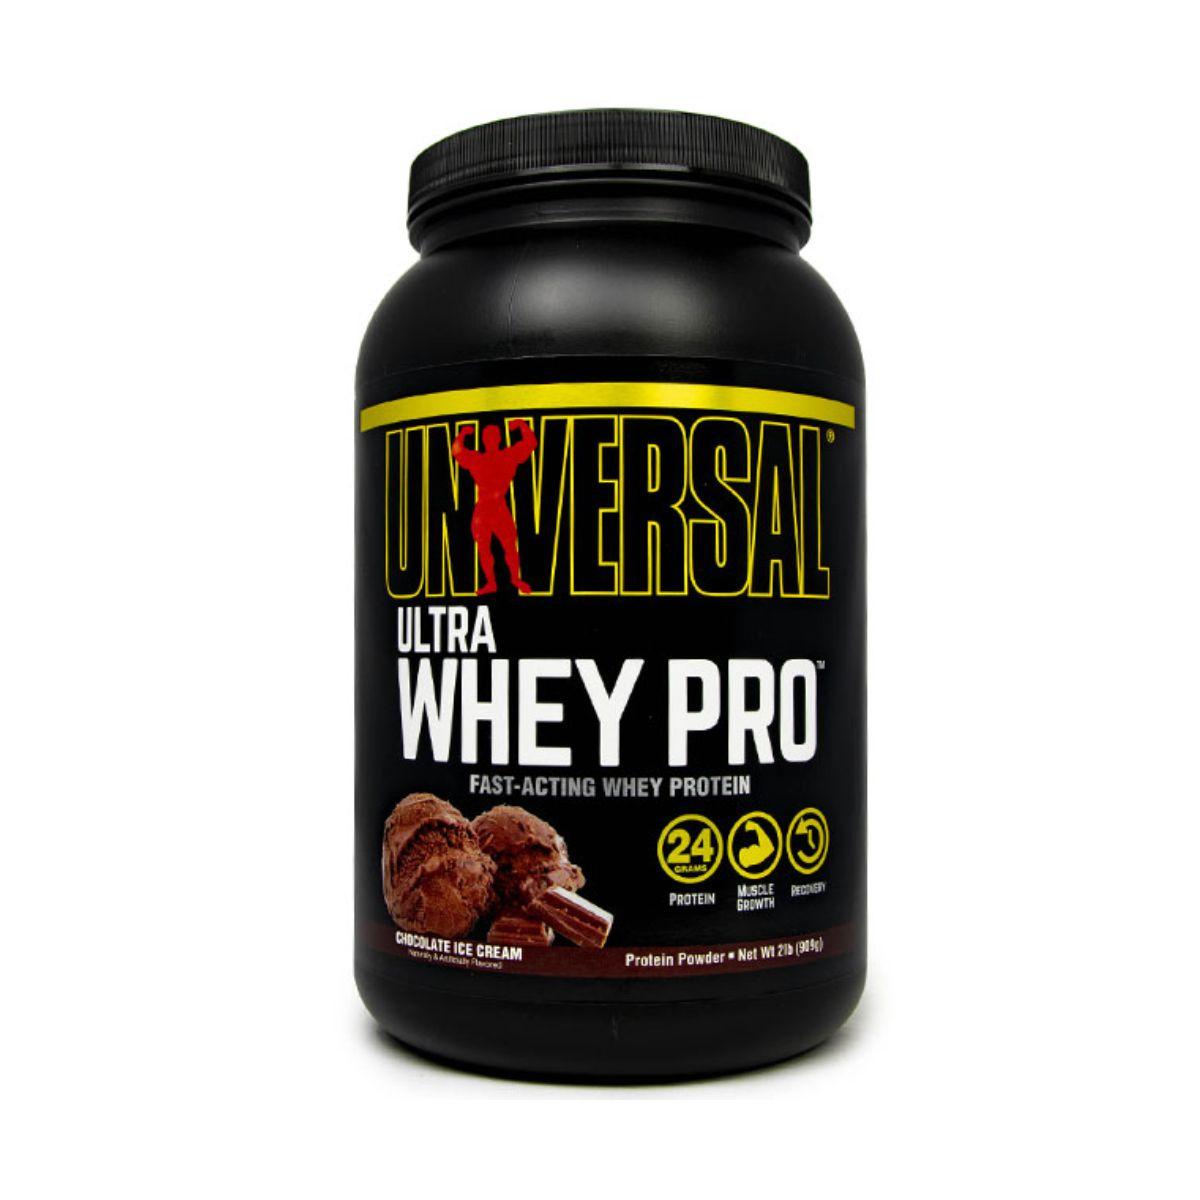 Ultra Whey Pro 909g - Universal Nutrition